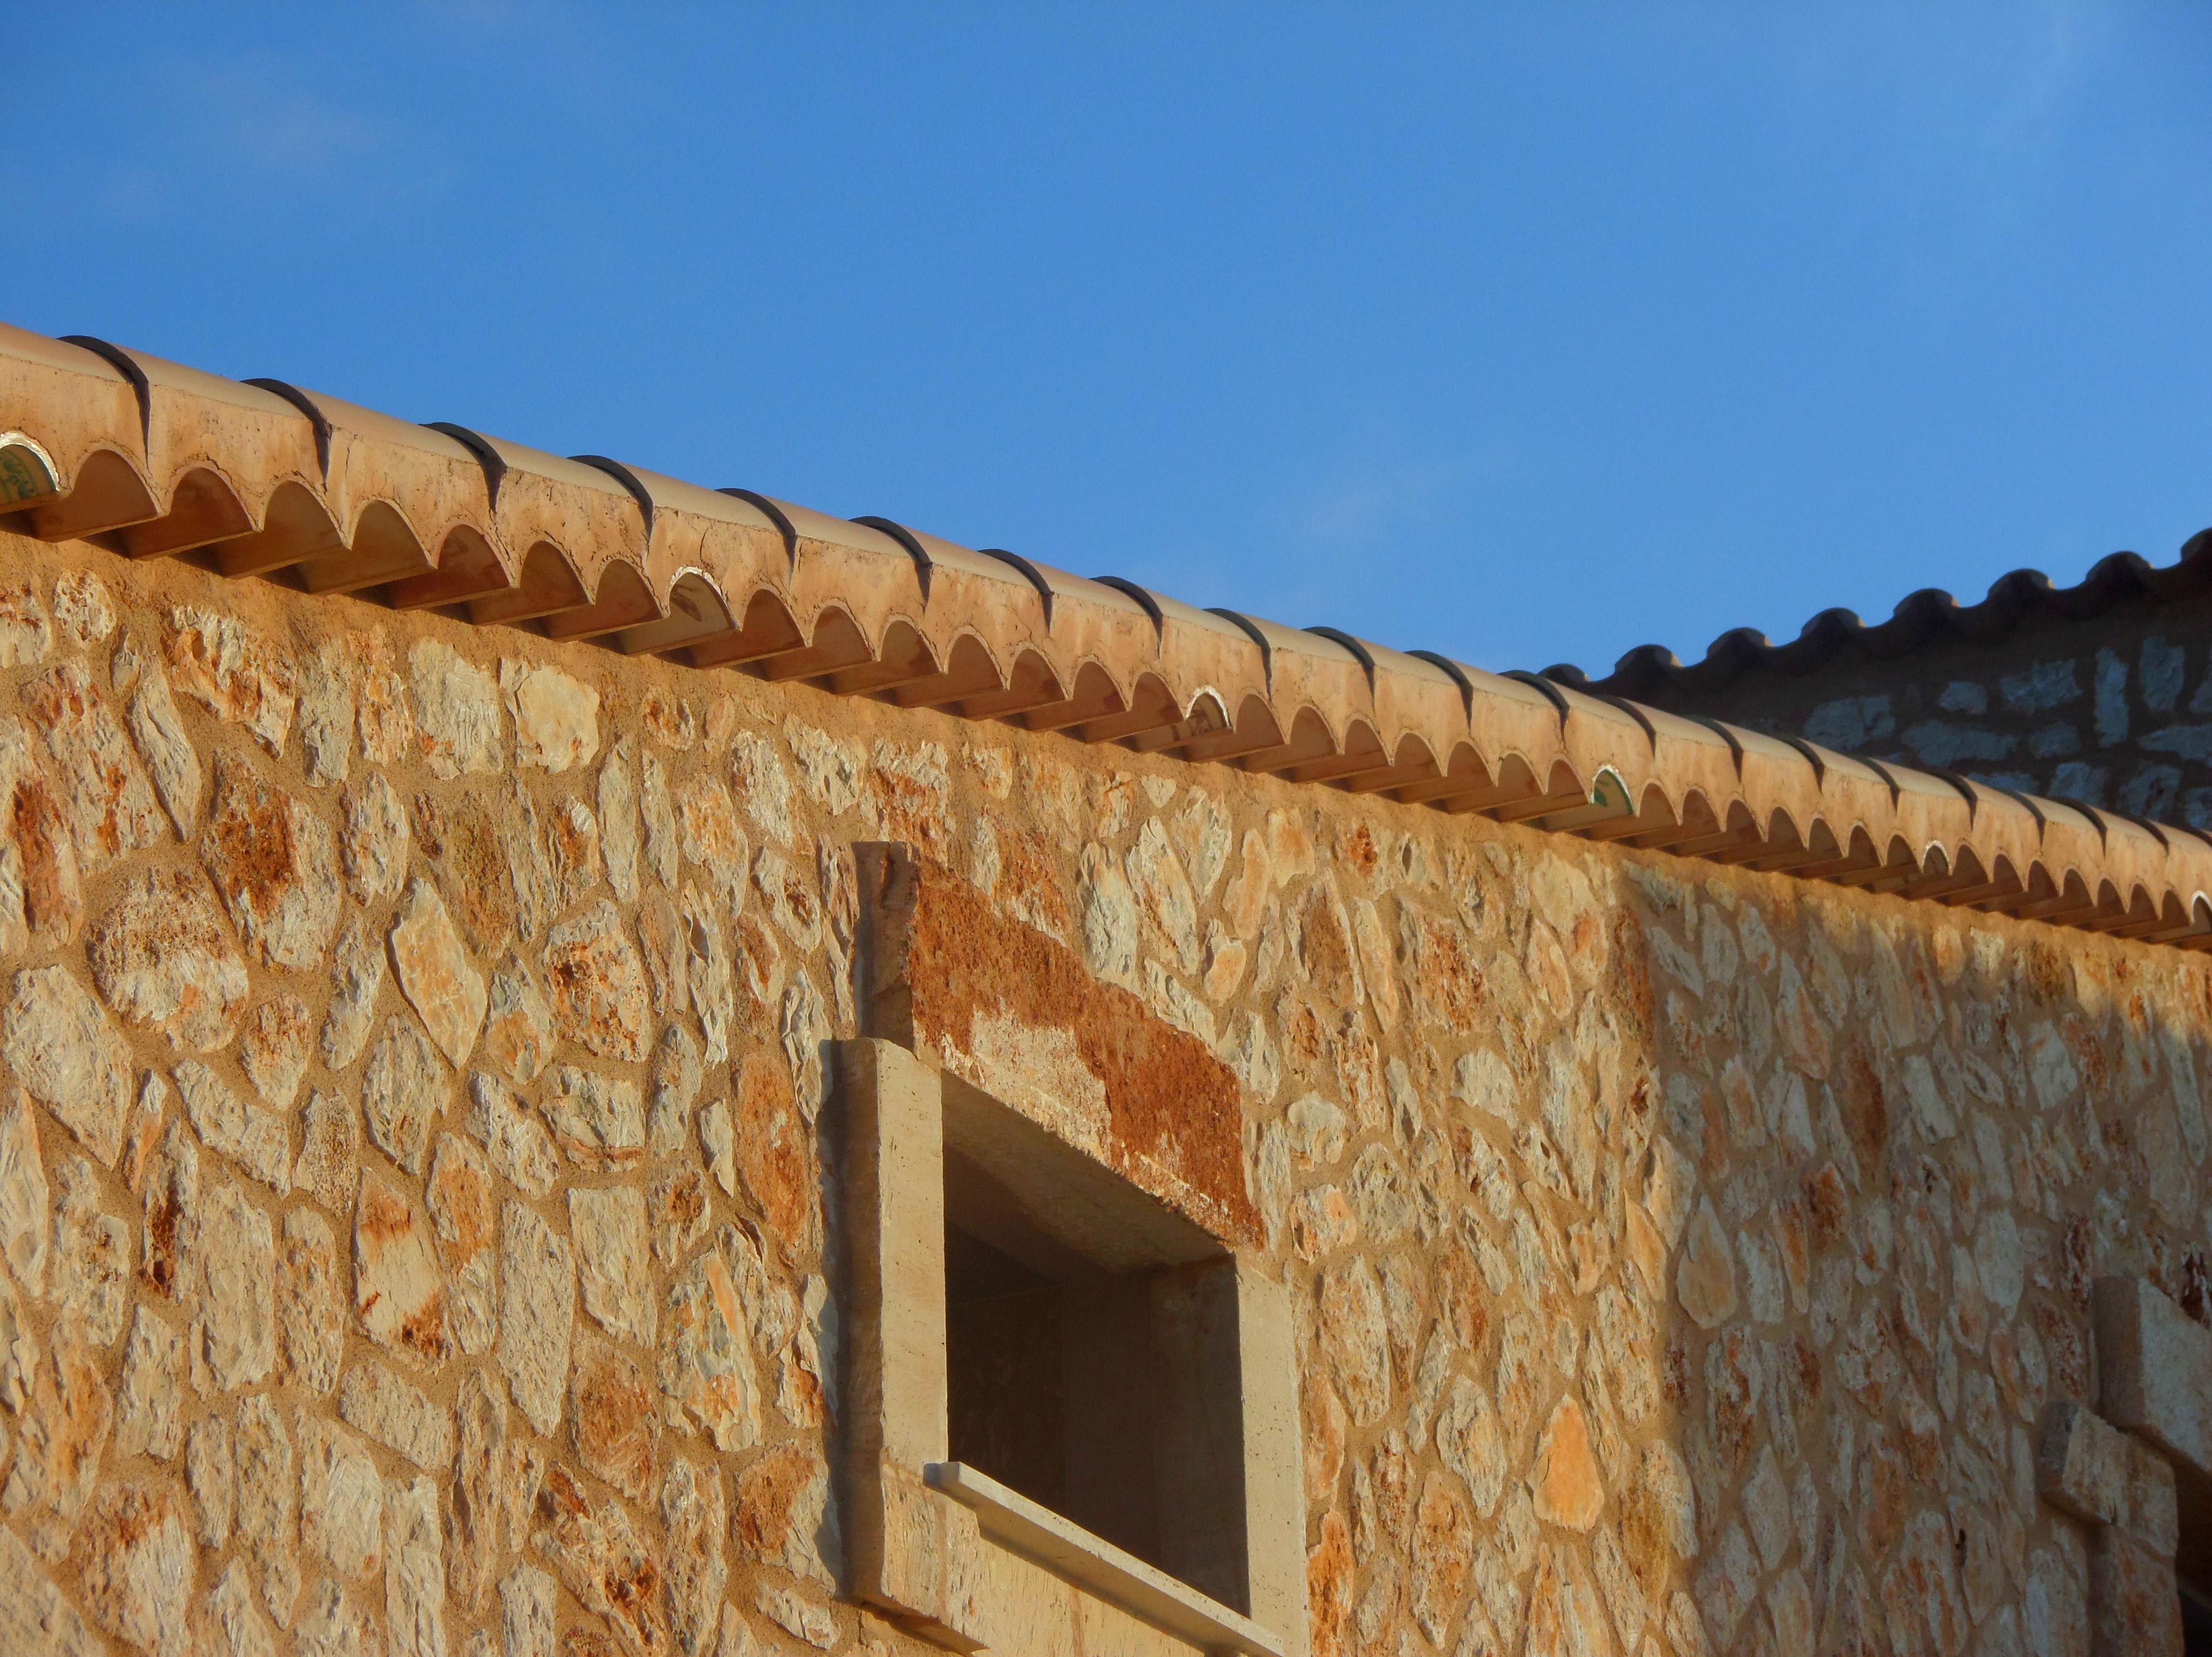 Detalle de cornisa con teja ceramica curva